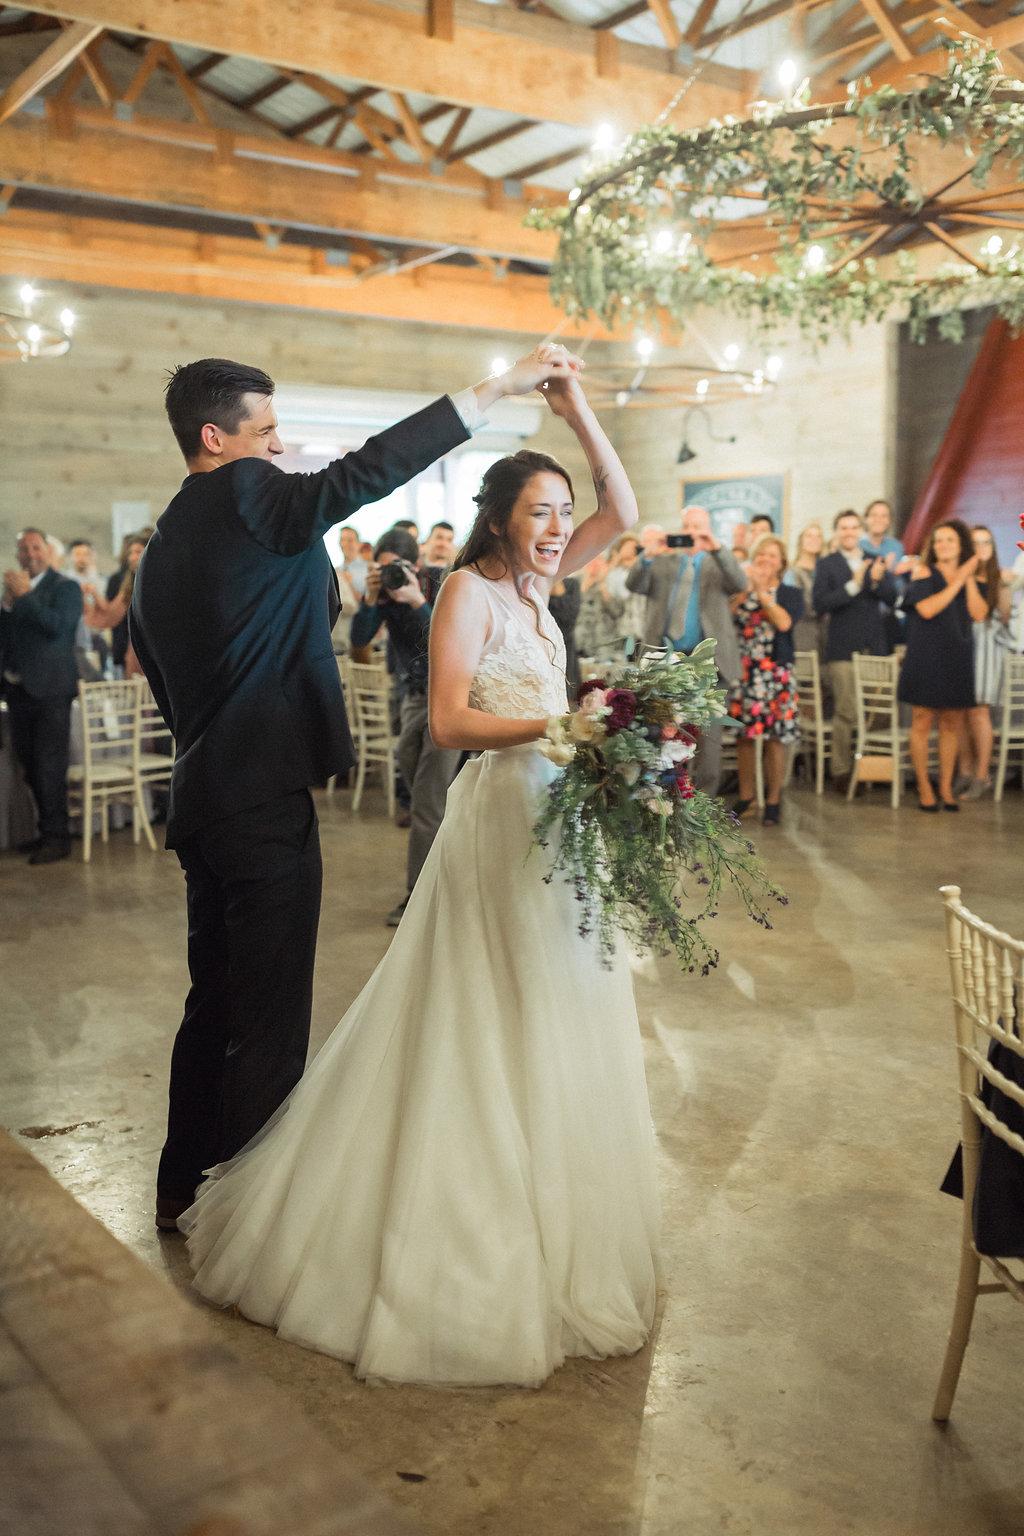 Honeysuckle-Hill-Weddings-Mallory-Patrick-108.jpg